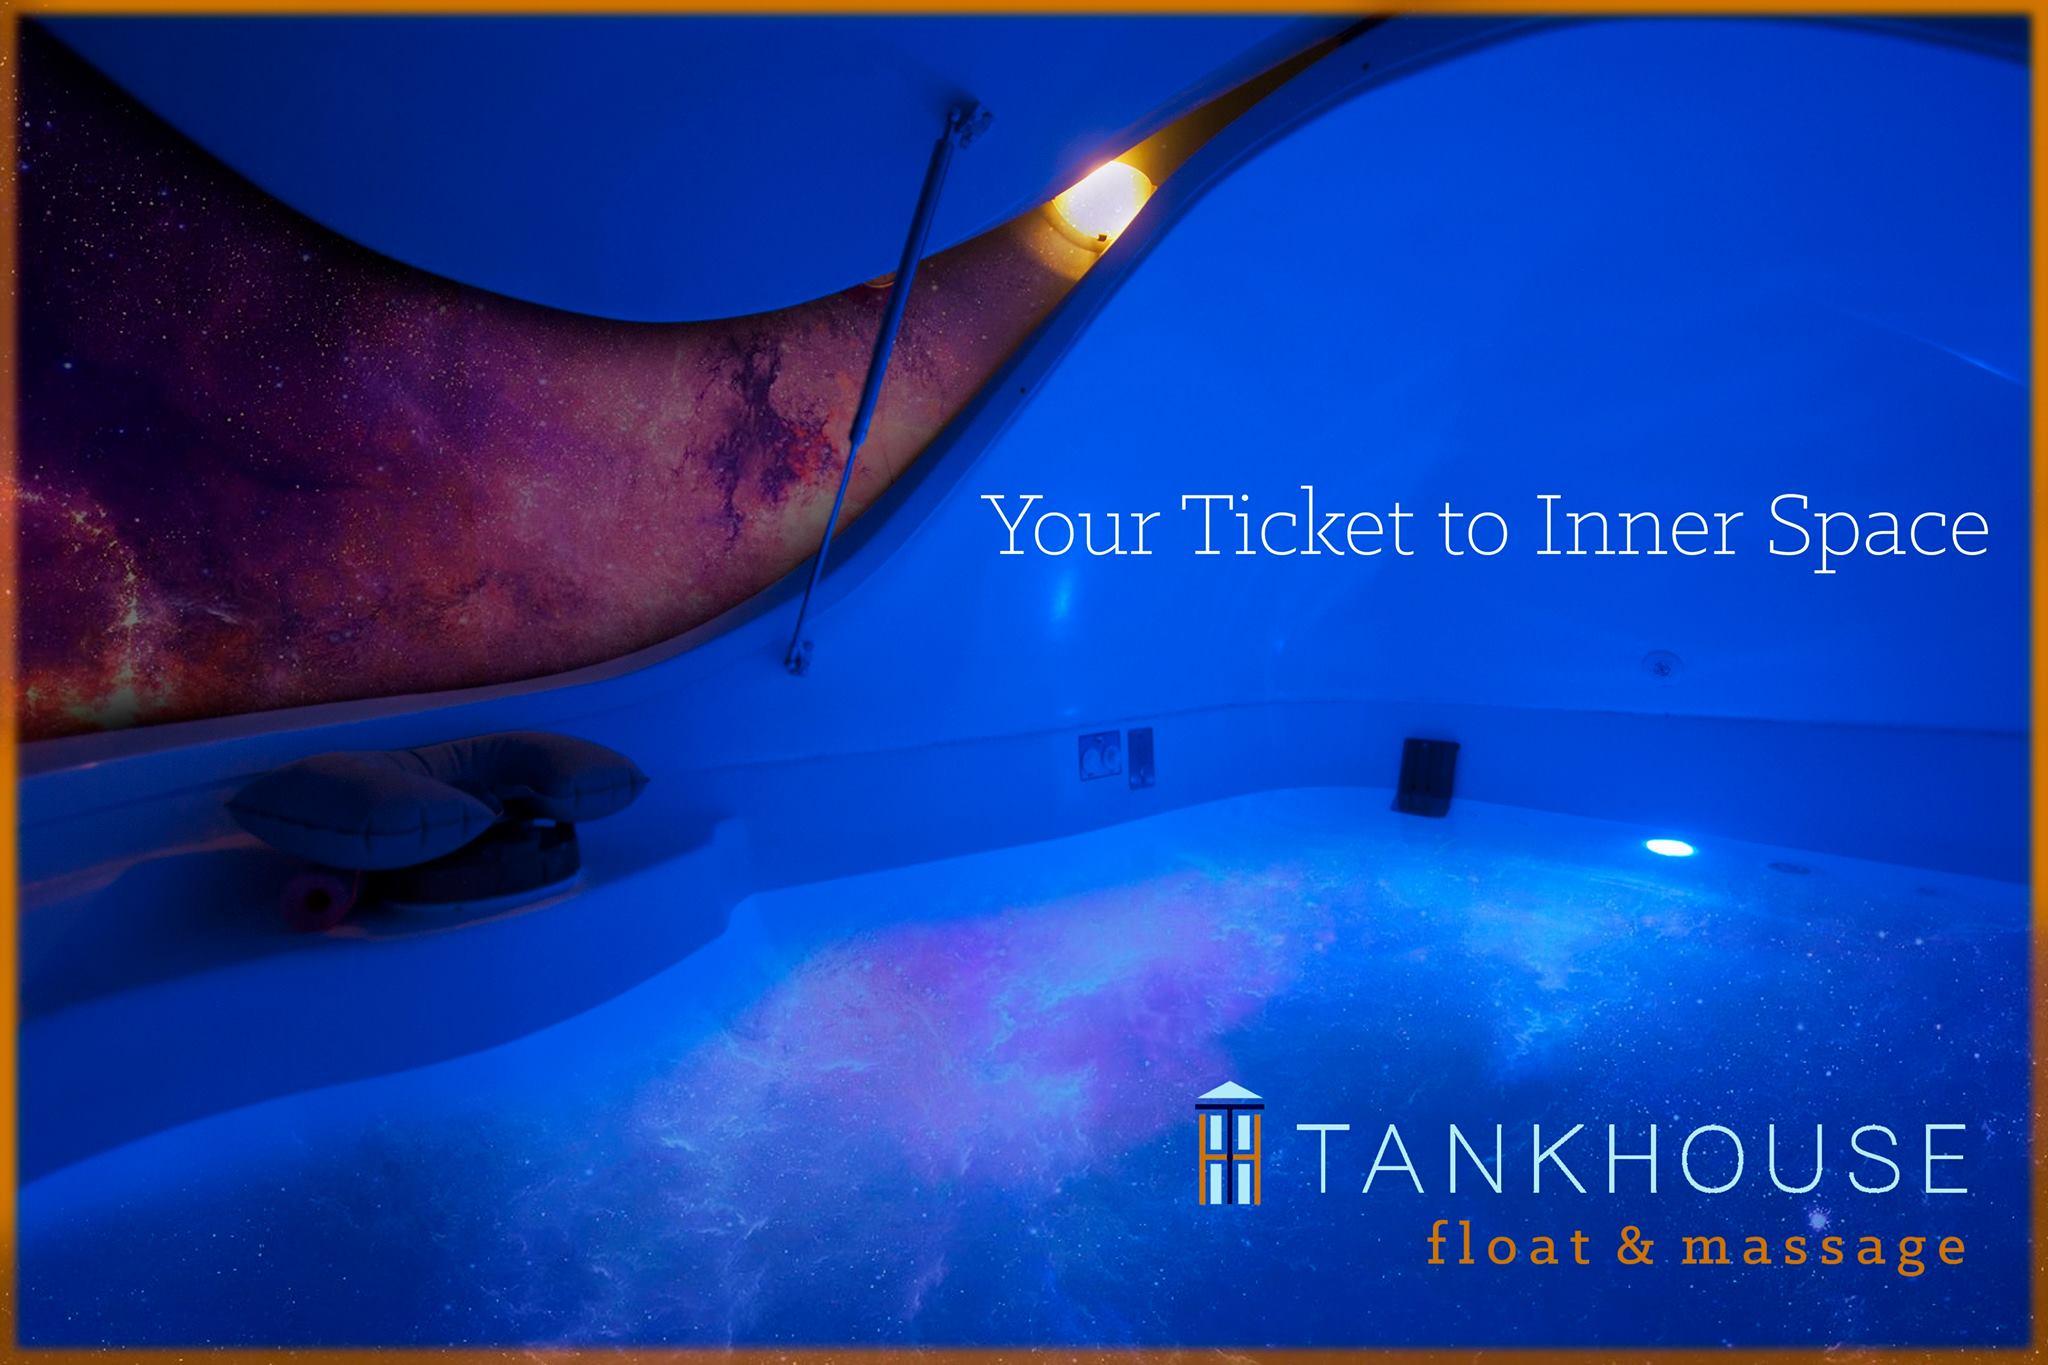 Kansas' Top Rated Local® Massage Therapists Award Winner: TankHouse Float & Massage